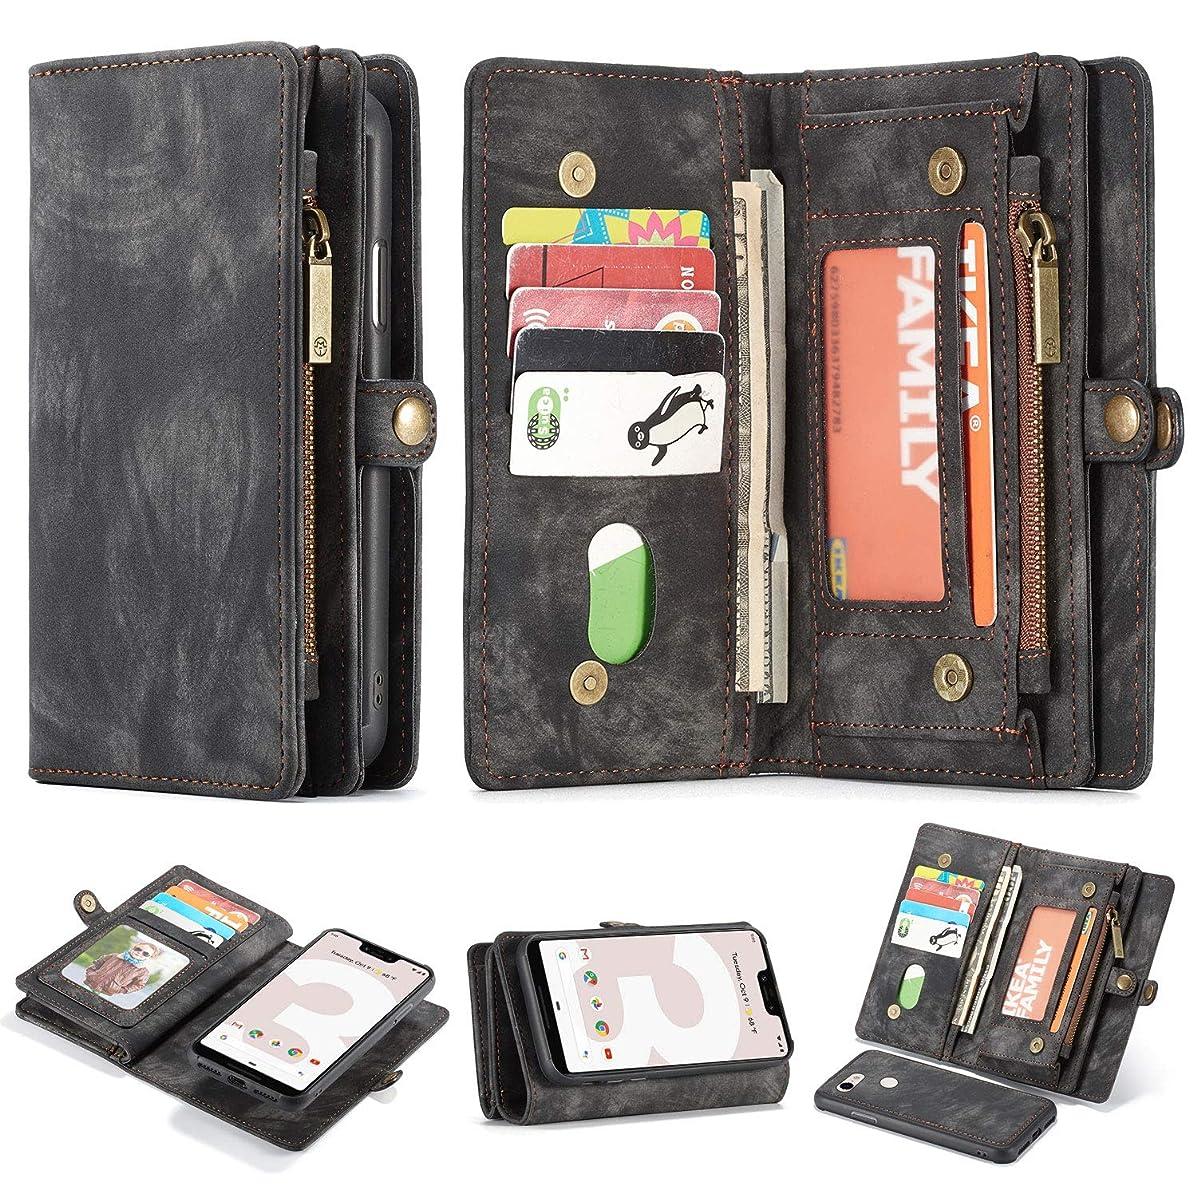 Google Pixel 3A XL Leather Wallet Zipper Purse Detachable Card Slots Holder Flip Case Magnetic Wrist Strap Handle Shockproof Cover Pocket Wallet Handbag for Google Pixel 3A XL (Black, Pixel 3A XL)